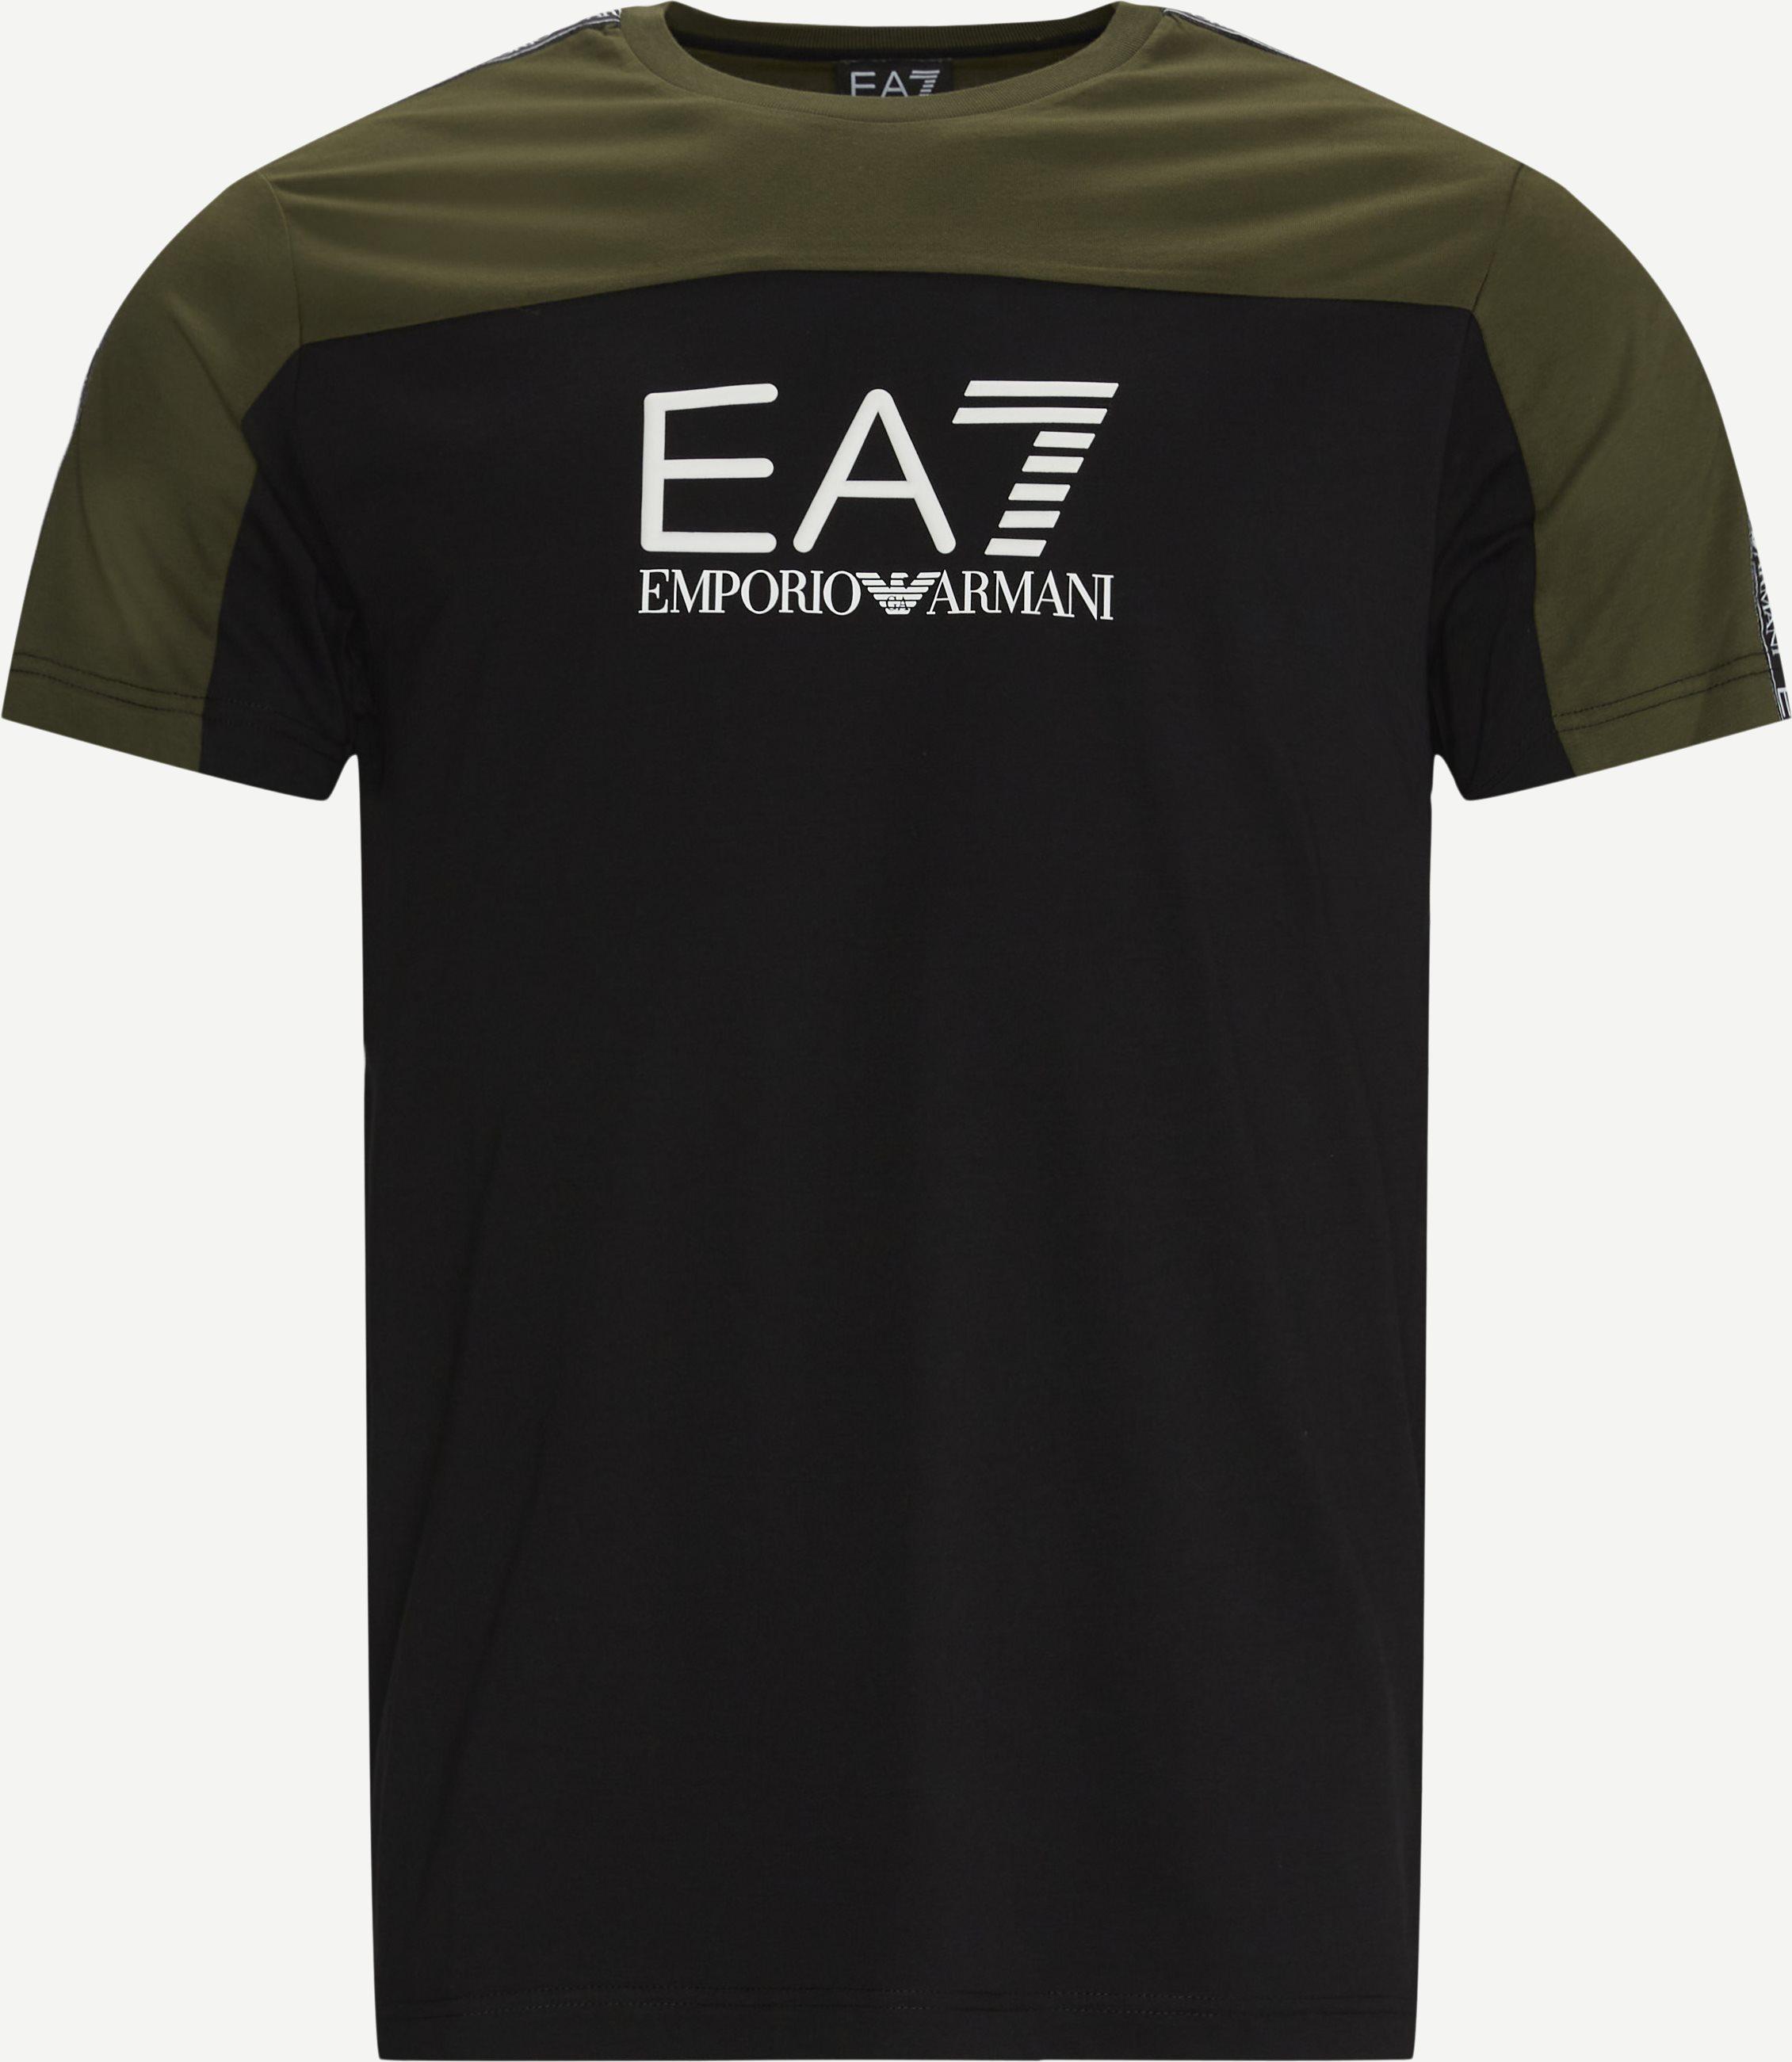 T-Shirts - Regular fit - Oliv